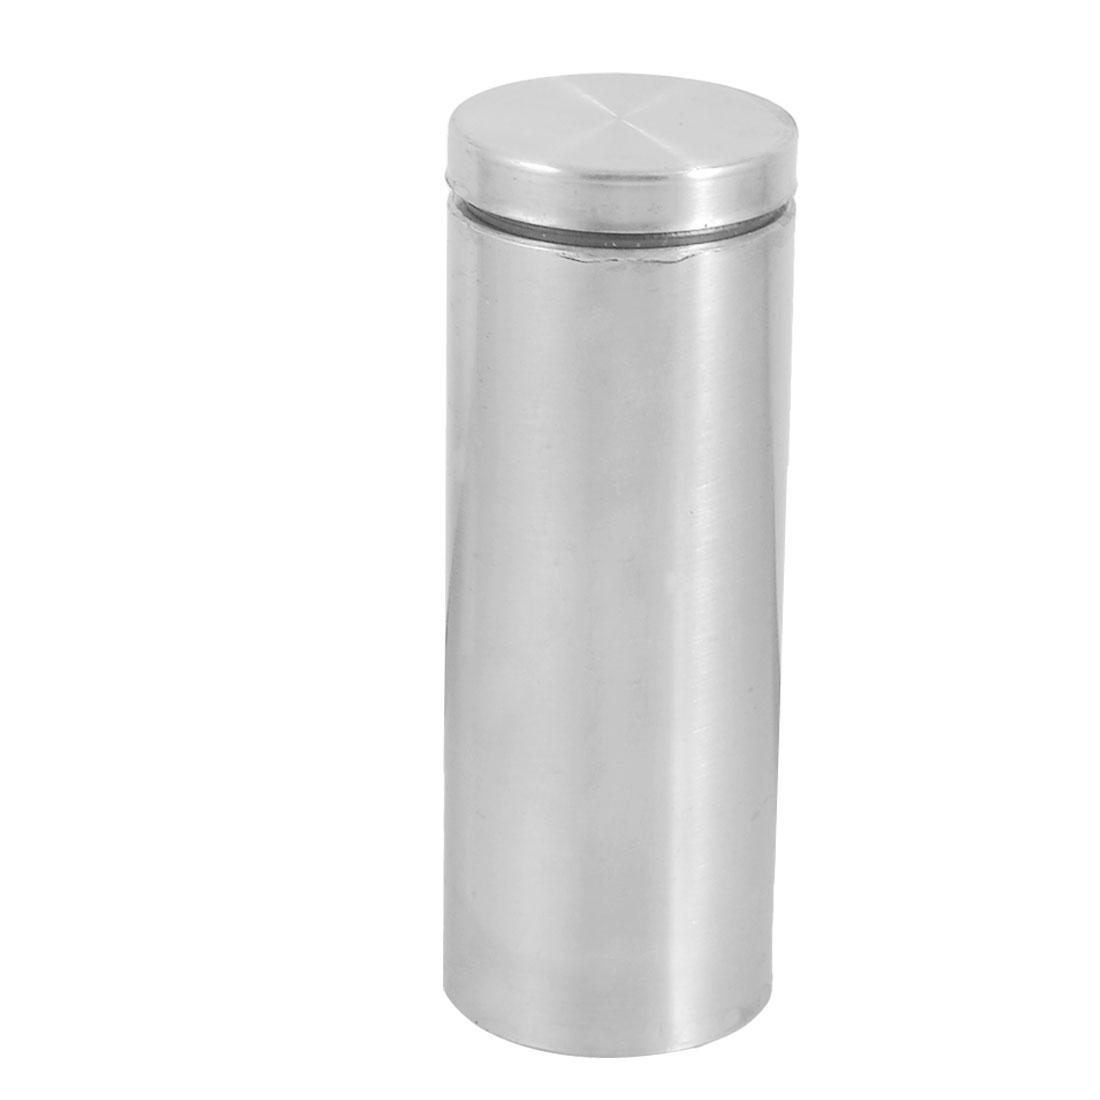 Stainless Steel 100mm Length 38mm Diameter Advertising Nail Screw